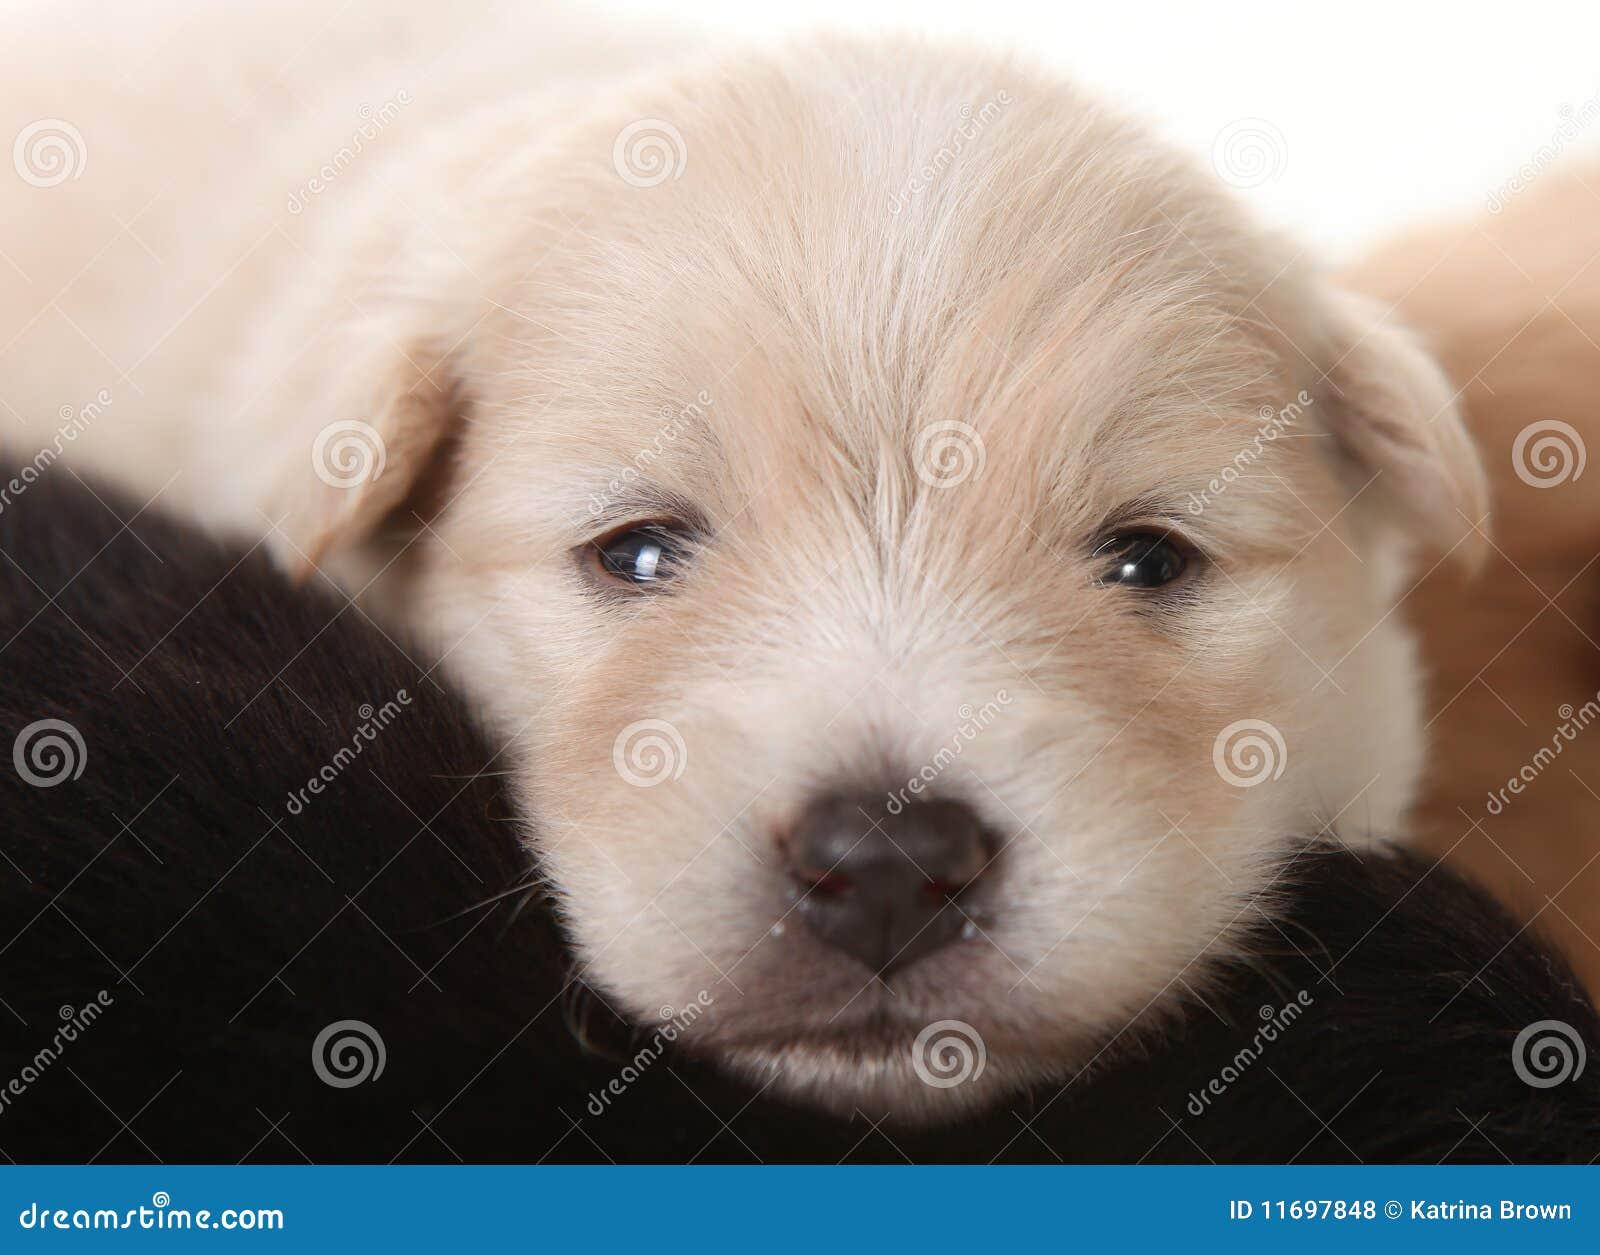 Newborn Pomeranian White Puppy Eyes Open Stock Photo Image Of